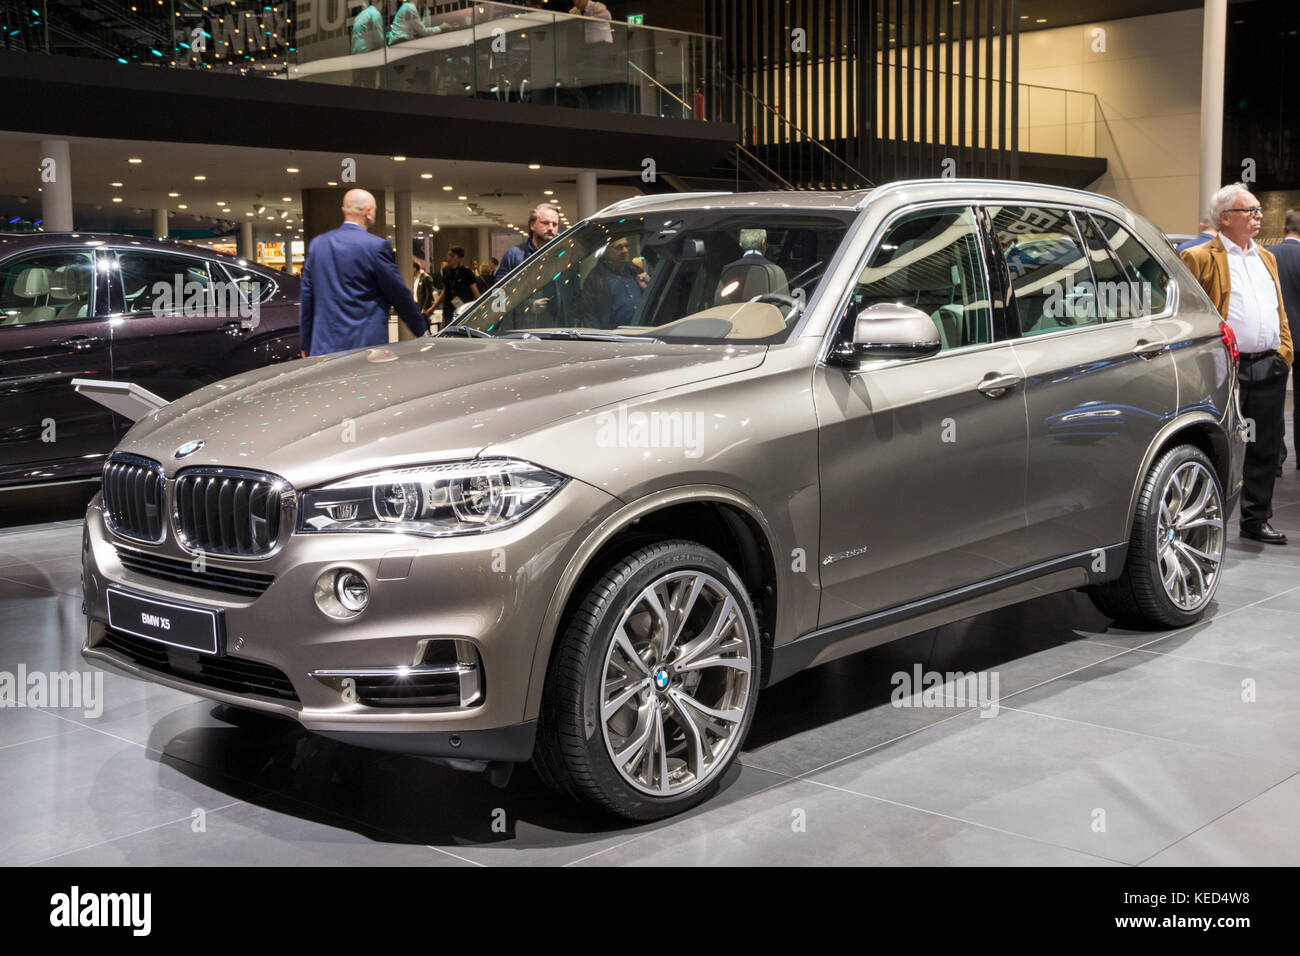 FRANKFURT, GERMANY - SEP 12, 2017: BMW X5 showcased at the Frankfurt IAA Motor Show 2017. - Stock Image